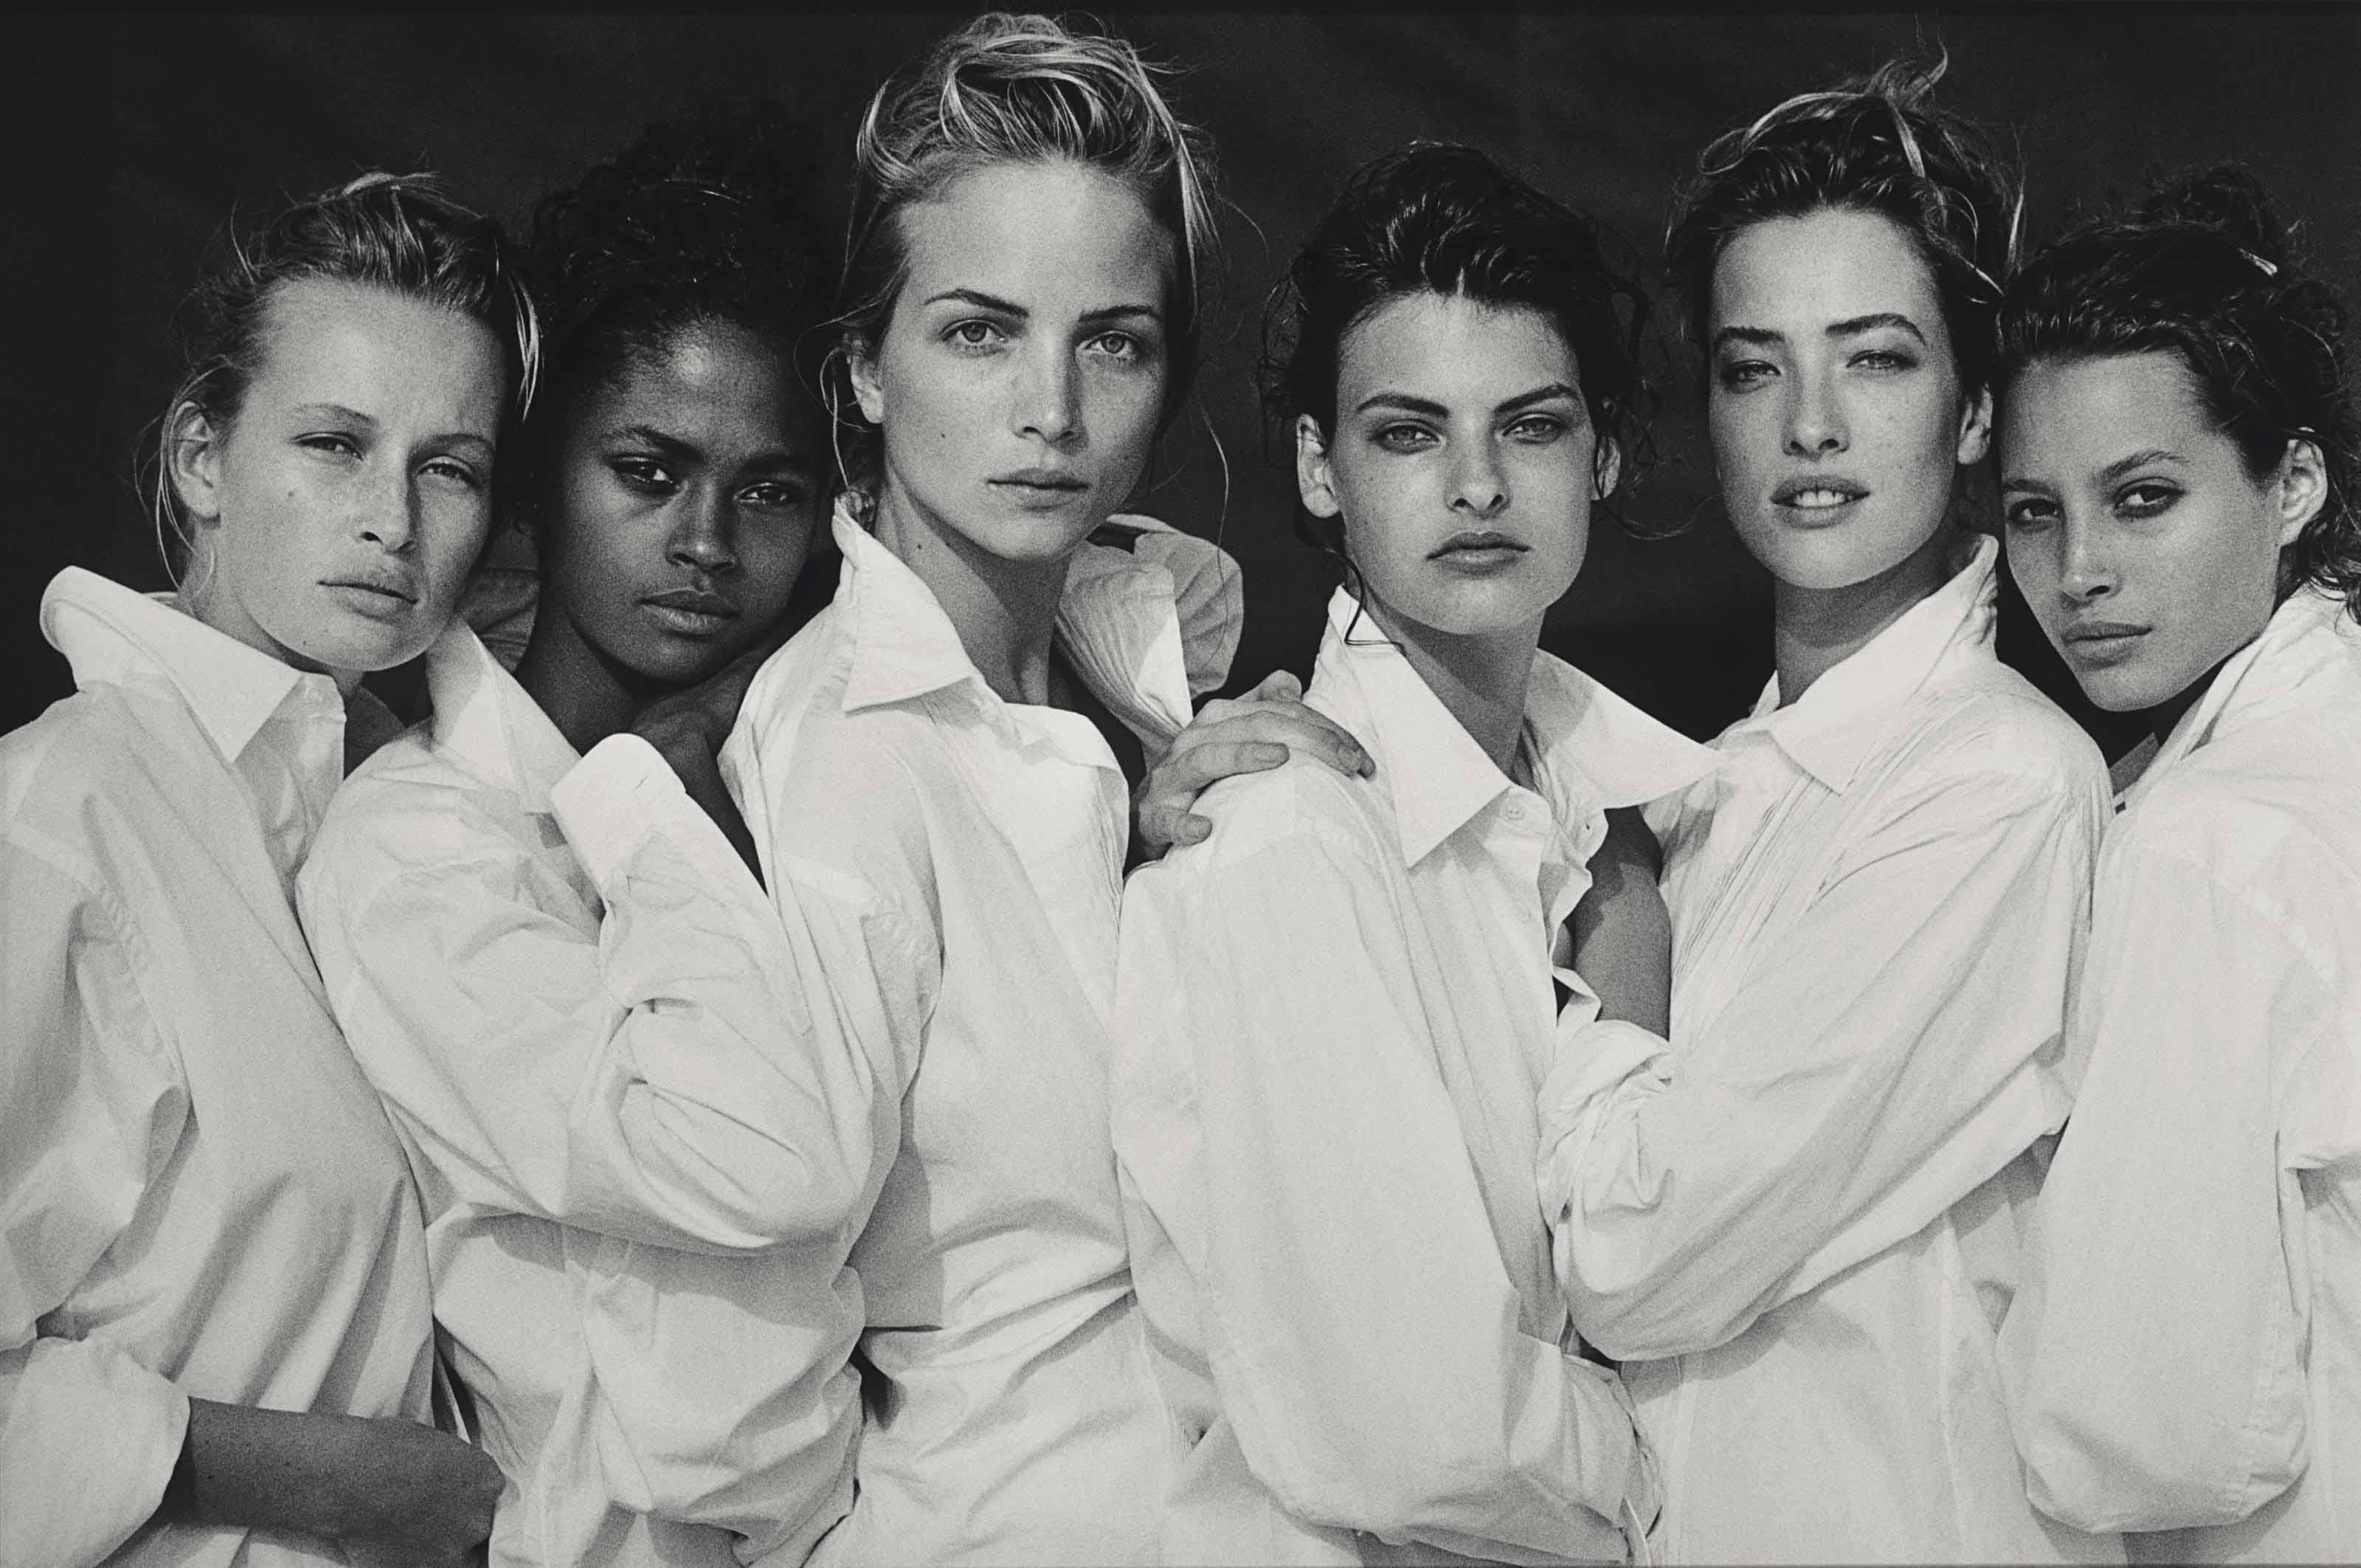 Estelle Lefébure, Karen Alexander, Rachel Williams, Linda Evangelista, Tatjana Patitz, Christy Turlington, Santa Monica, California, 1988